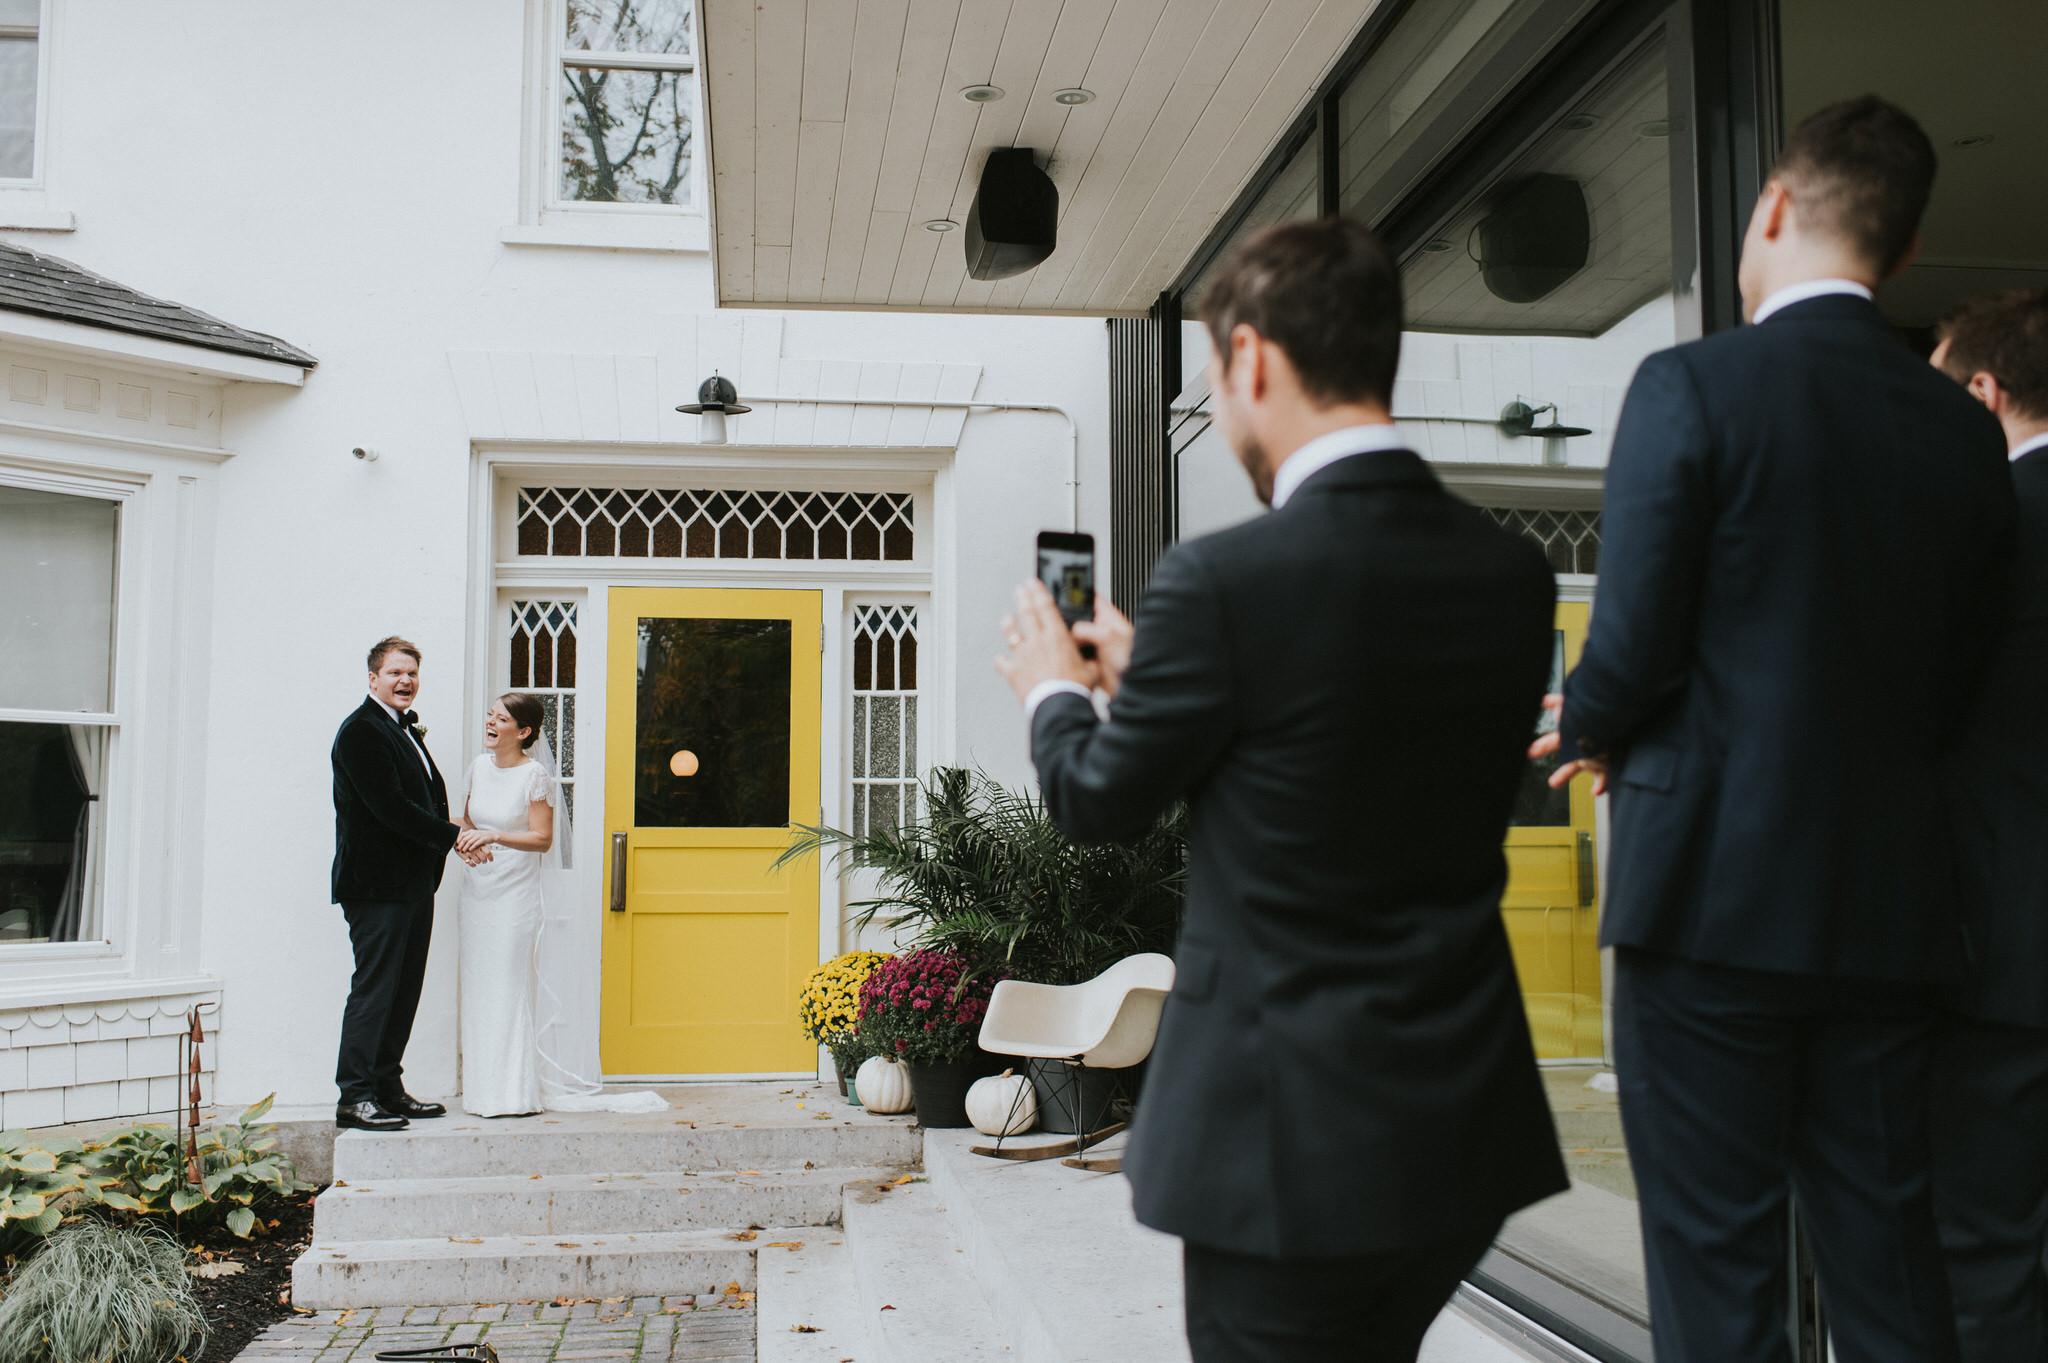 scarletoneillphotography_weddingphotography_prince edward county weddings049.JPG